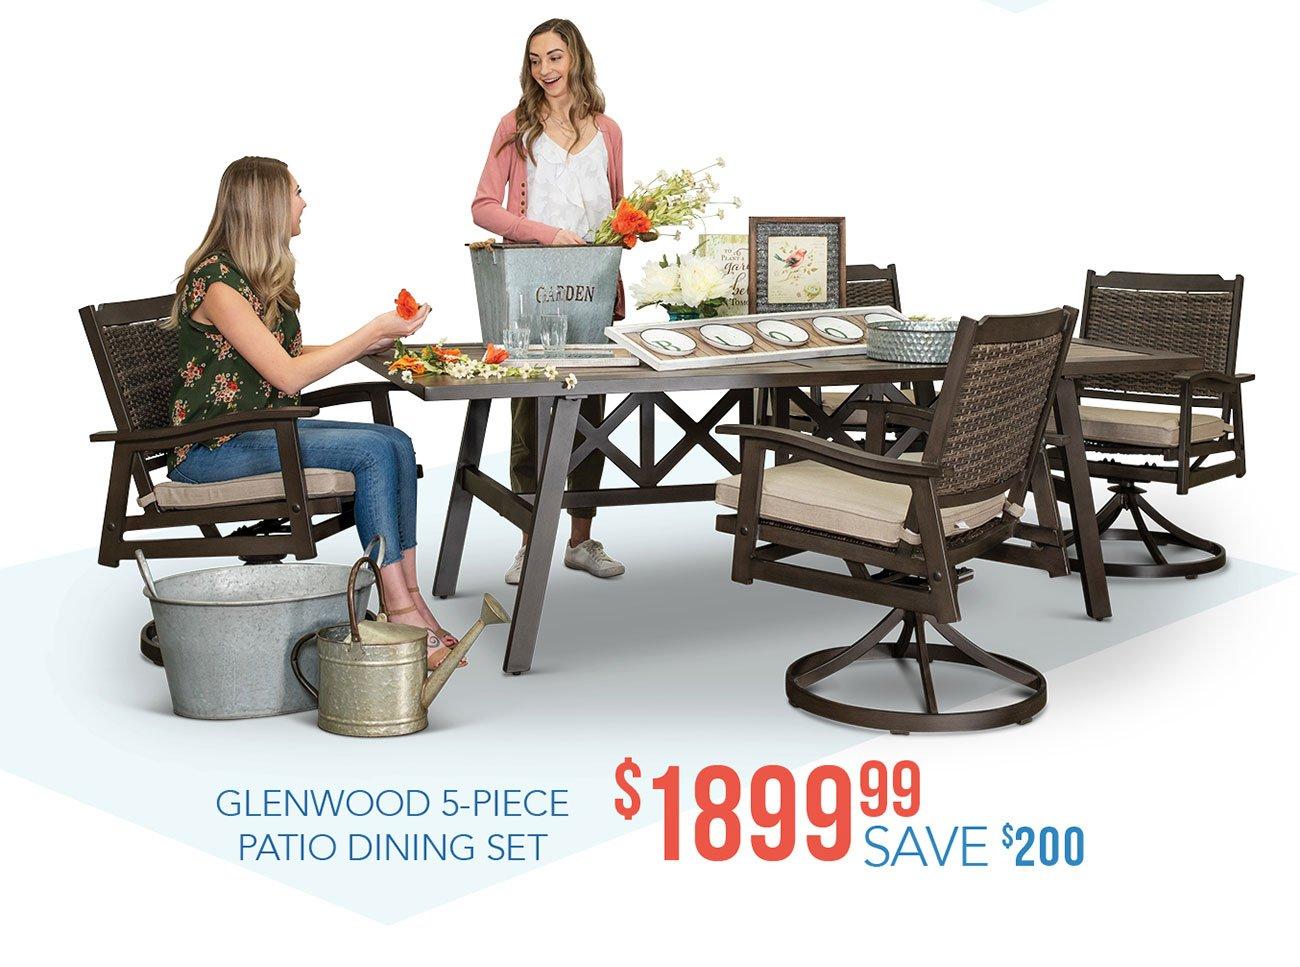 Glenwood-patio-dining-sunbed